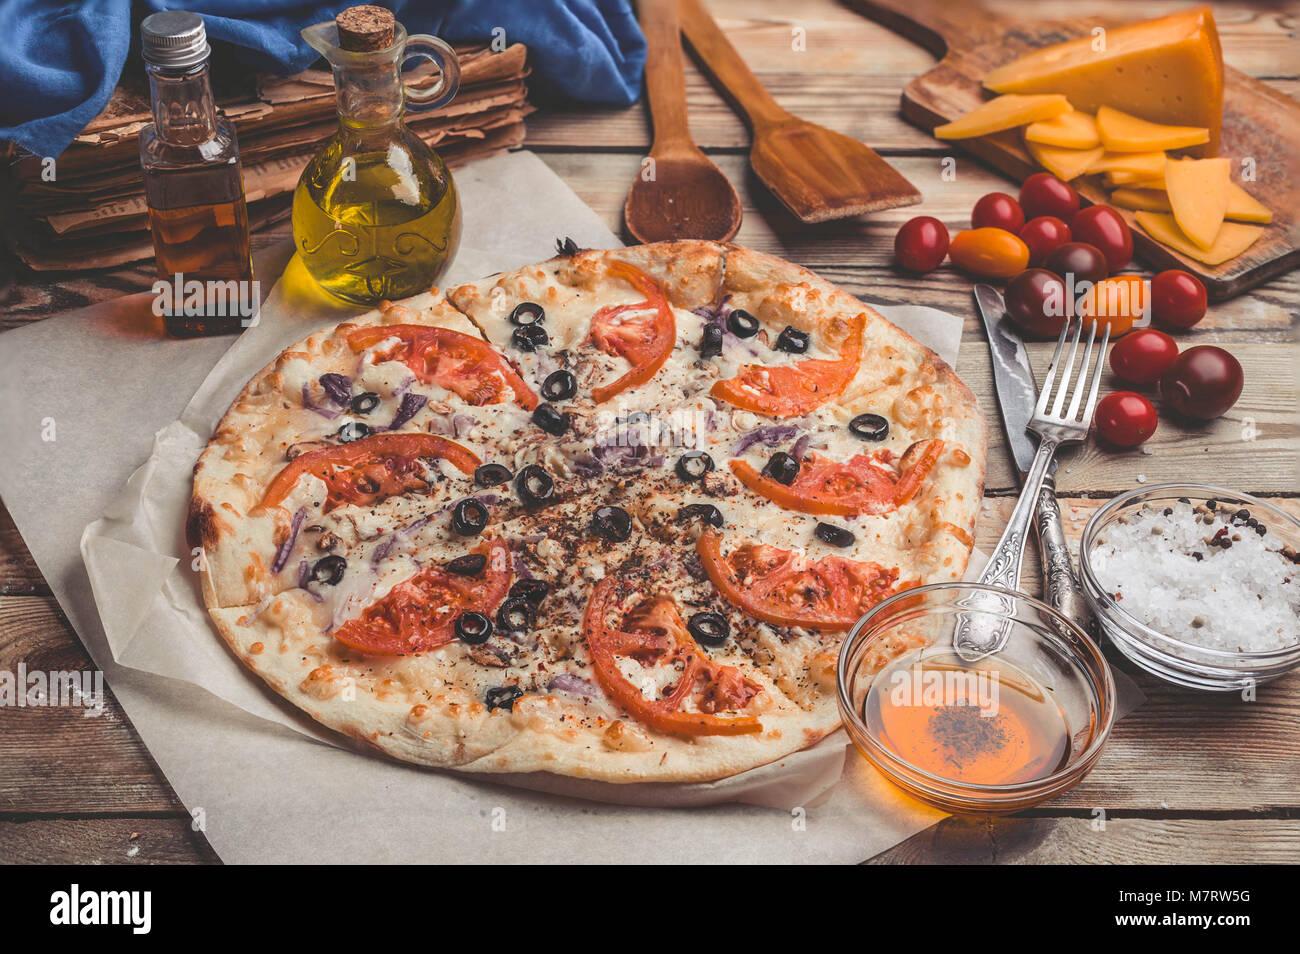 Thin Crust Pizza Stockfotos & Thin Crust Pizza Bilder - Alamy